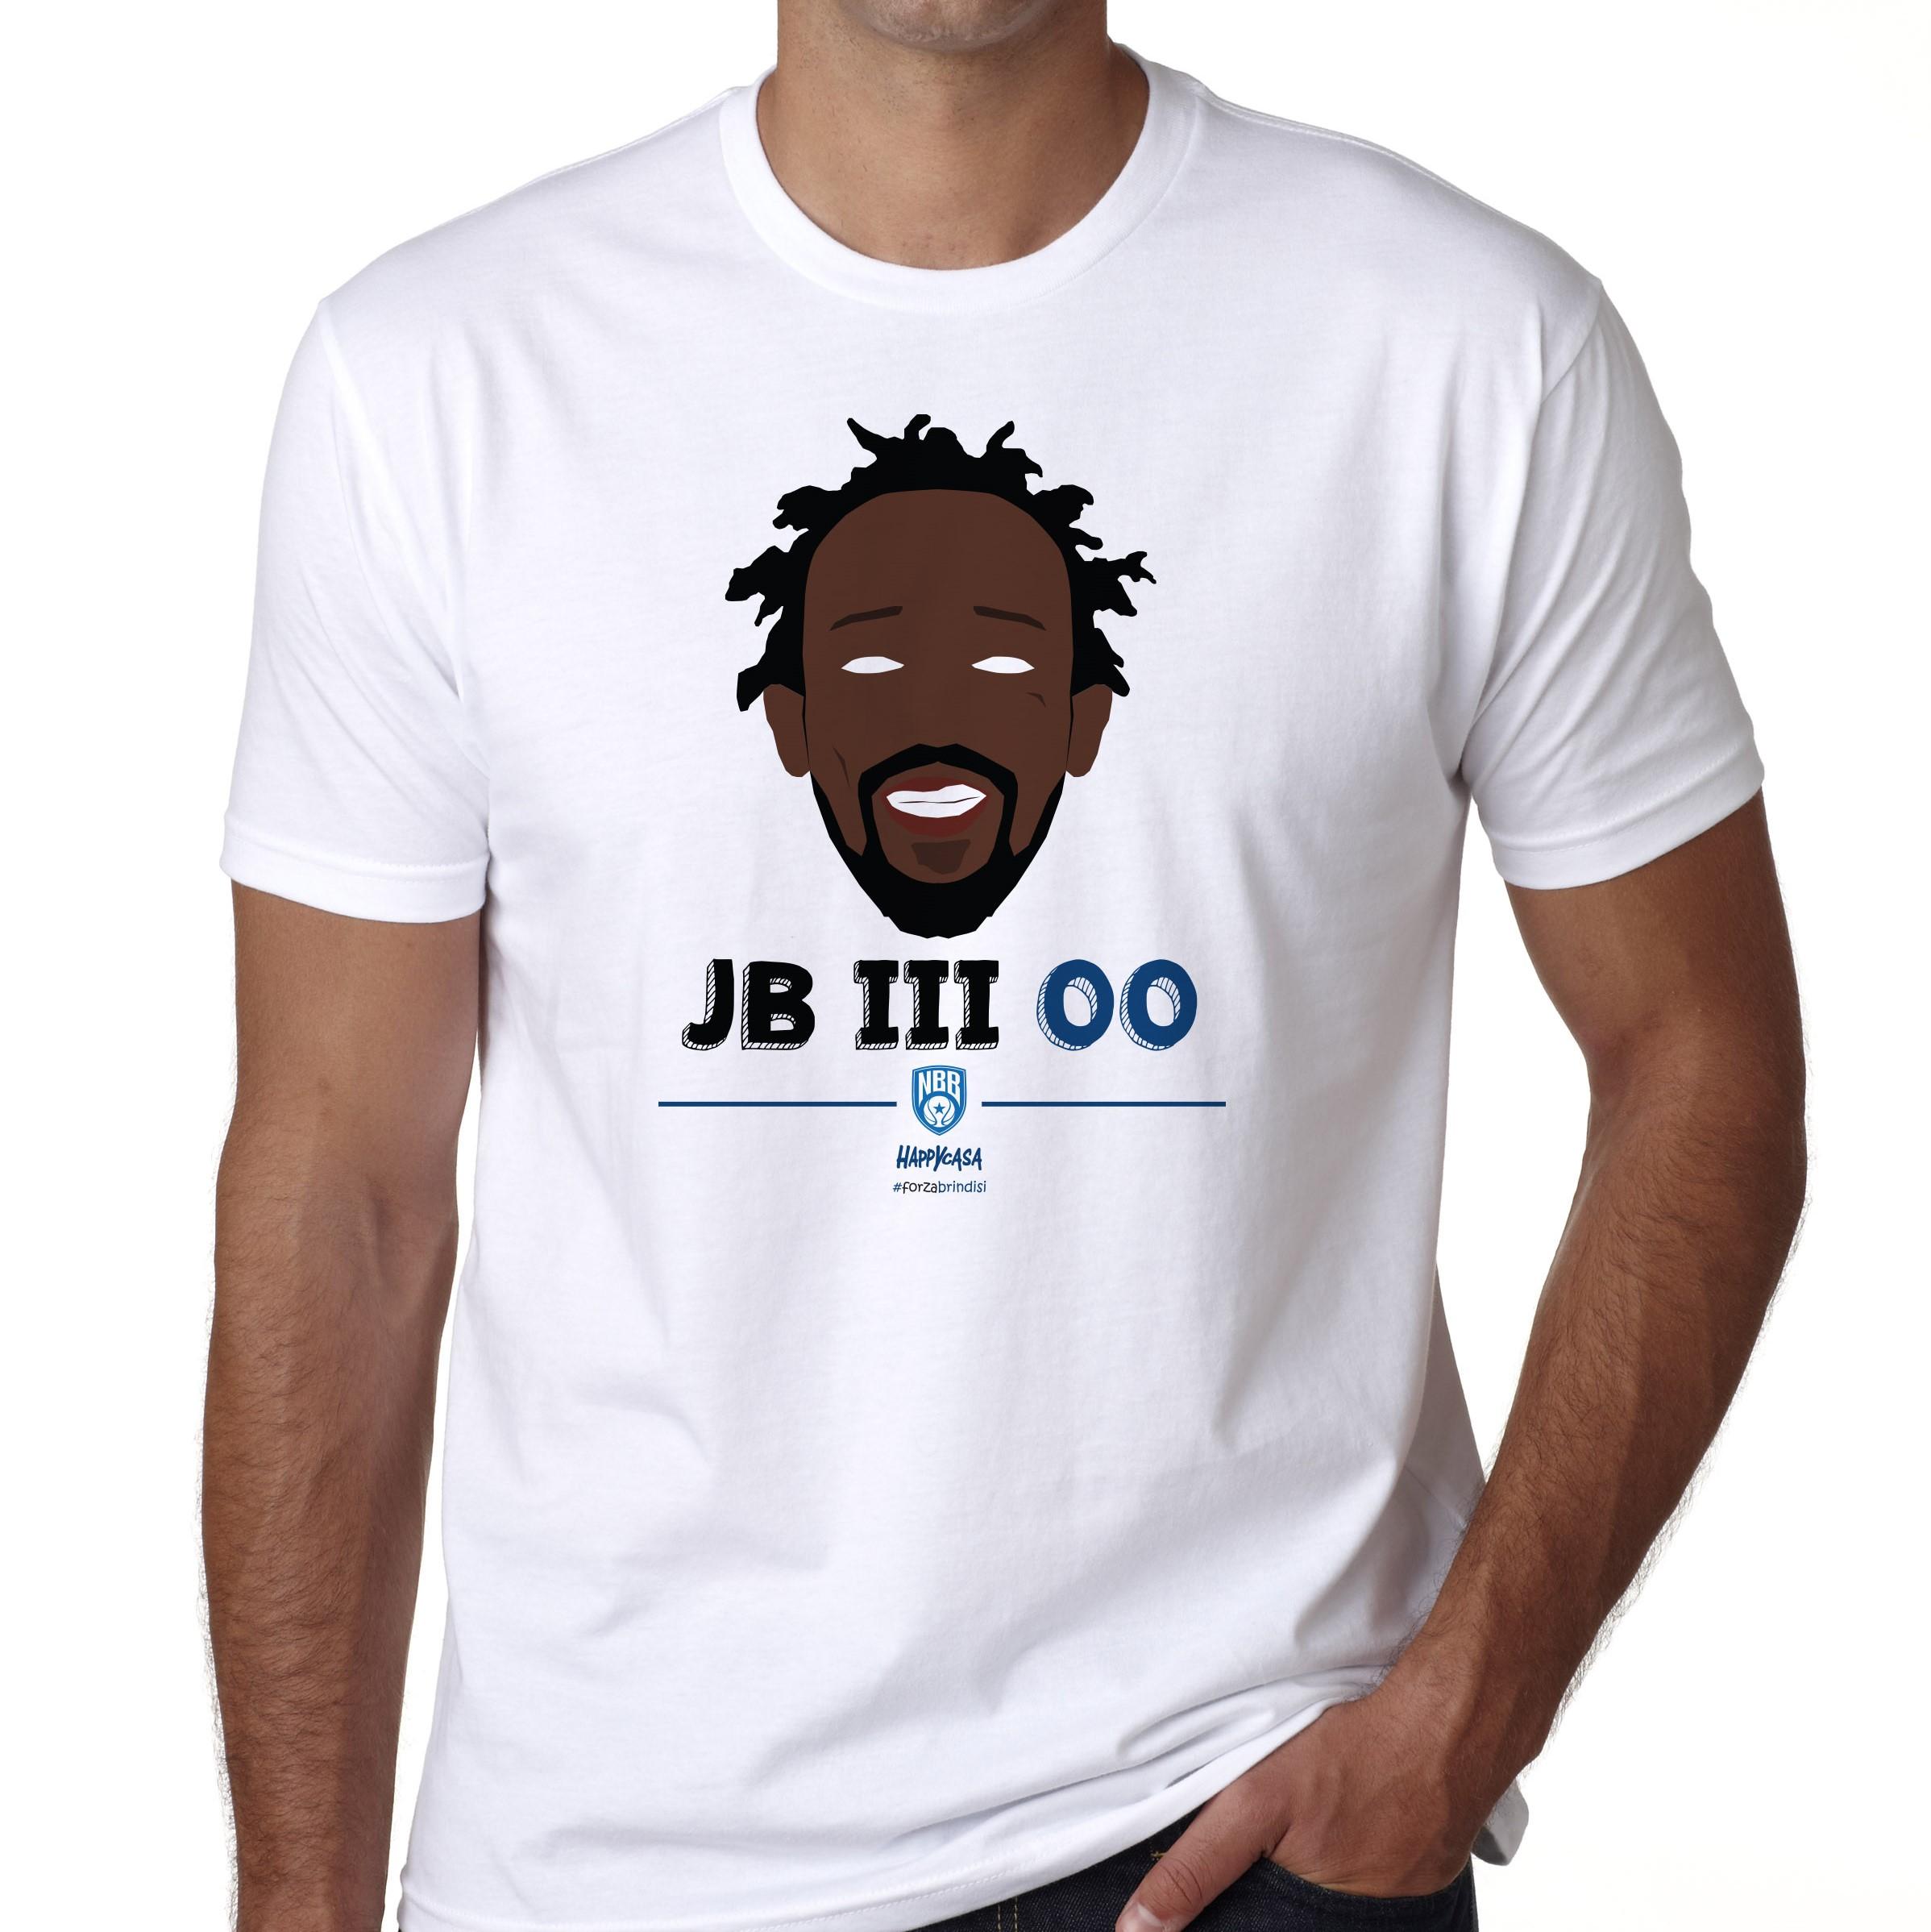 https://www.newbasketbrindisi.it/wp-content/uploads/2019/07/00-JBIII-Copia.jpg